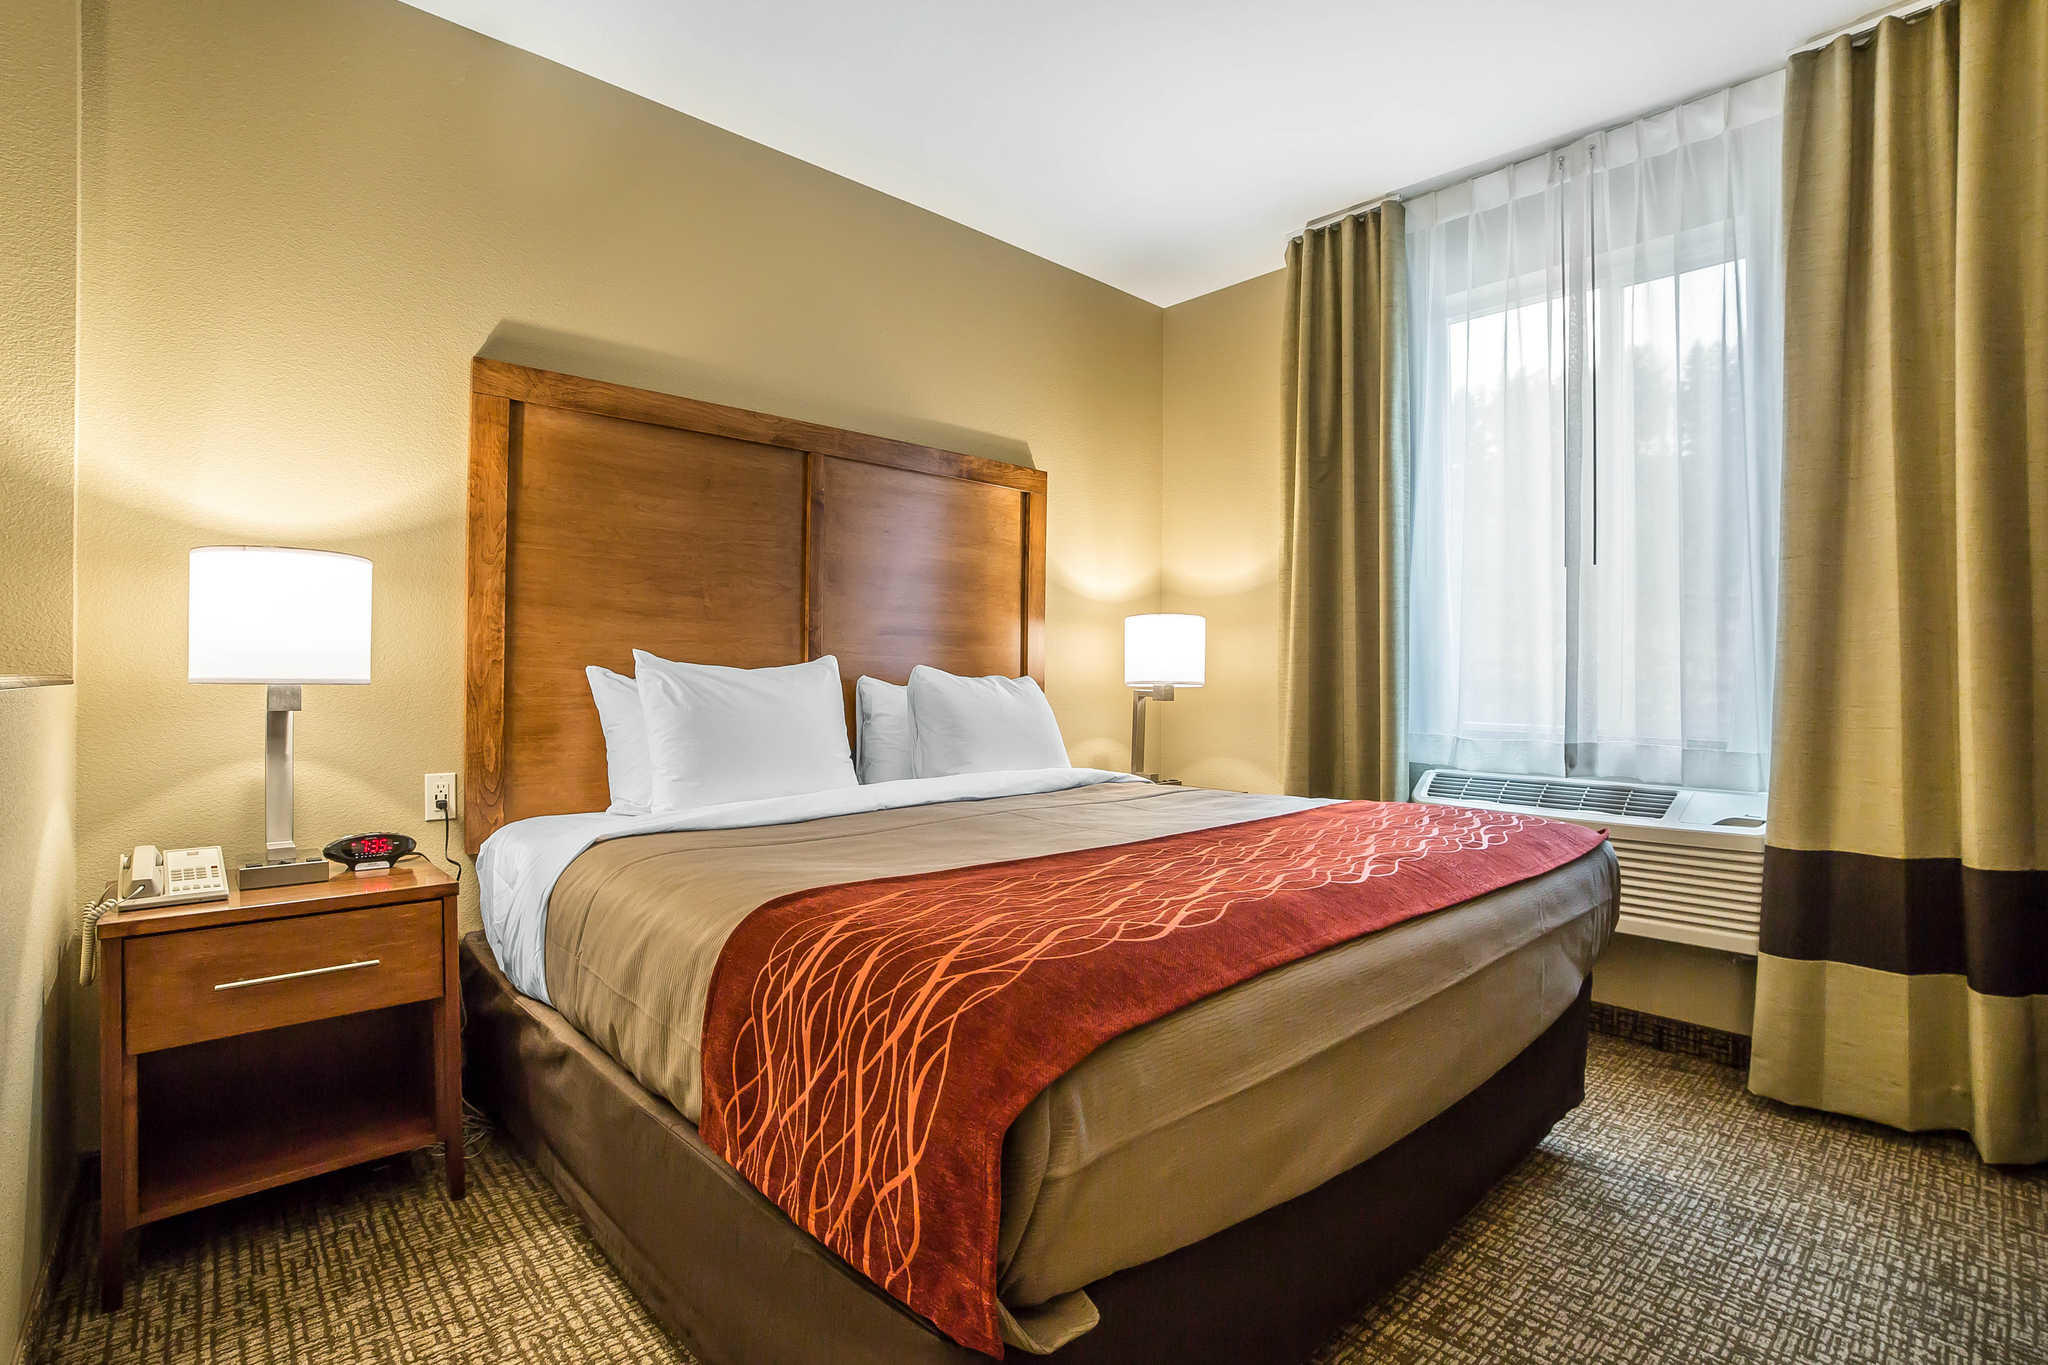 Comfort Inn & Suites Near Mt. Rushmore image 18